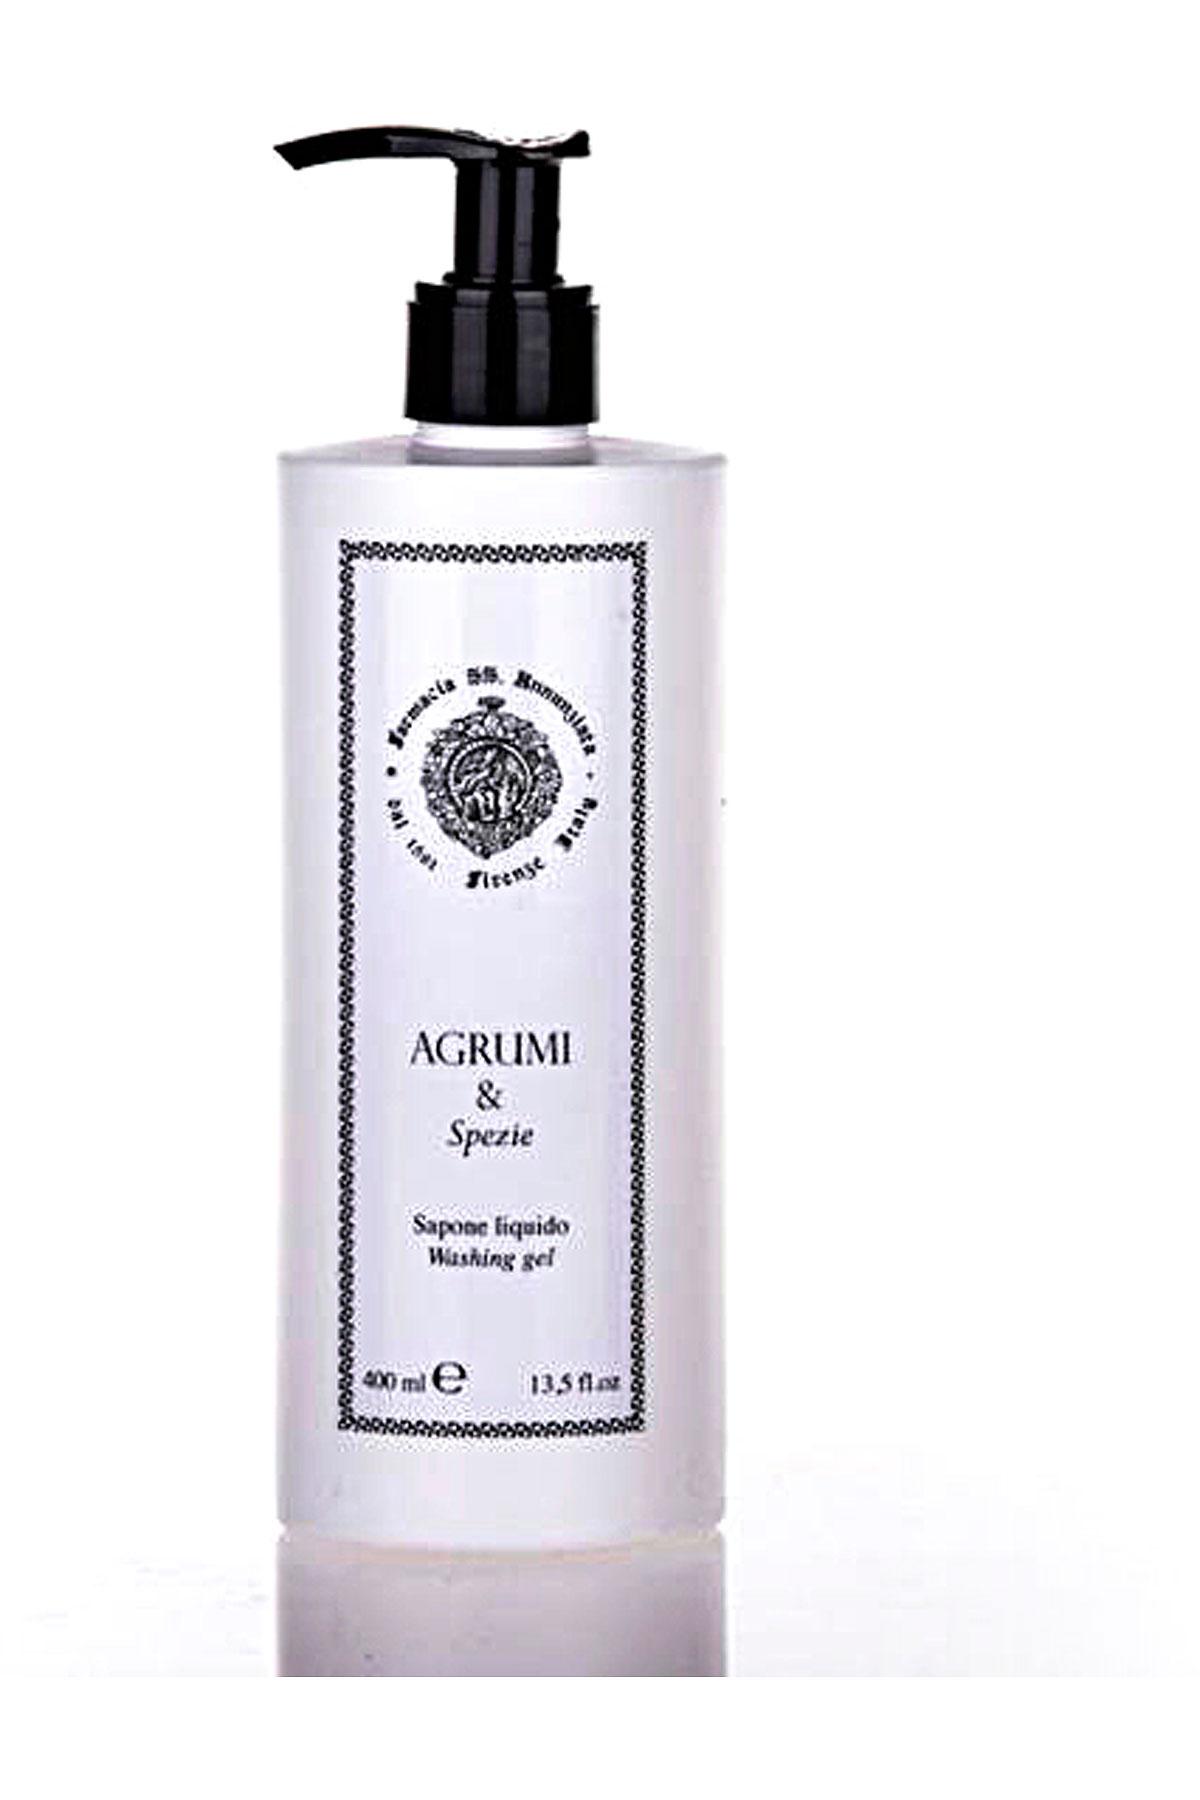 Farmacia Ss Annunziata 1561 Beauty for Women On Sale, Agrumi E Spezie - Liquid Soap - 400 Ml, 2019, 400 ml